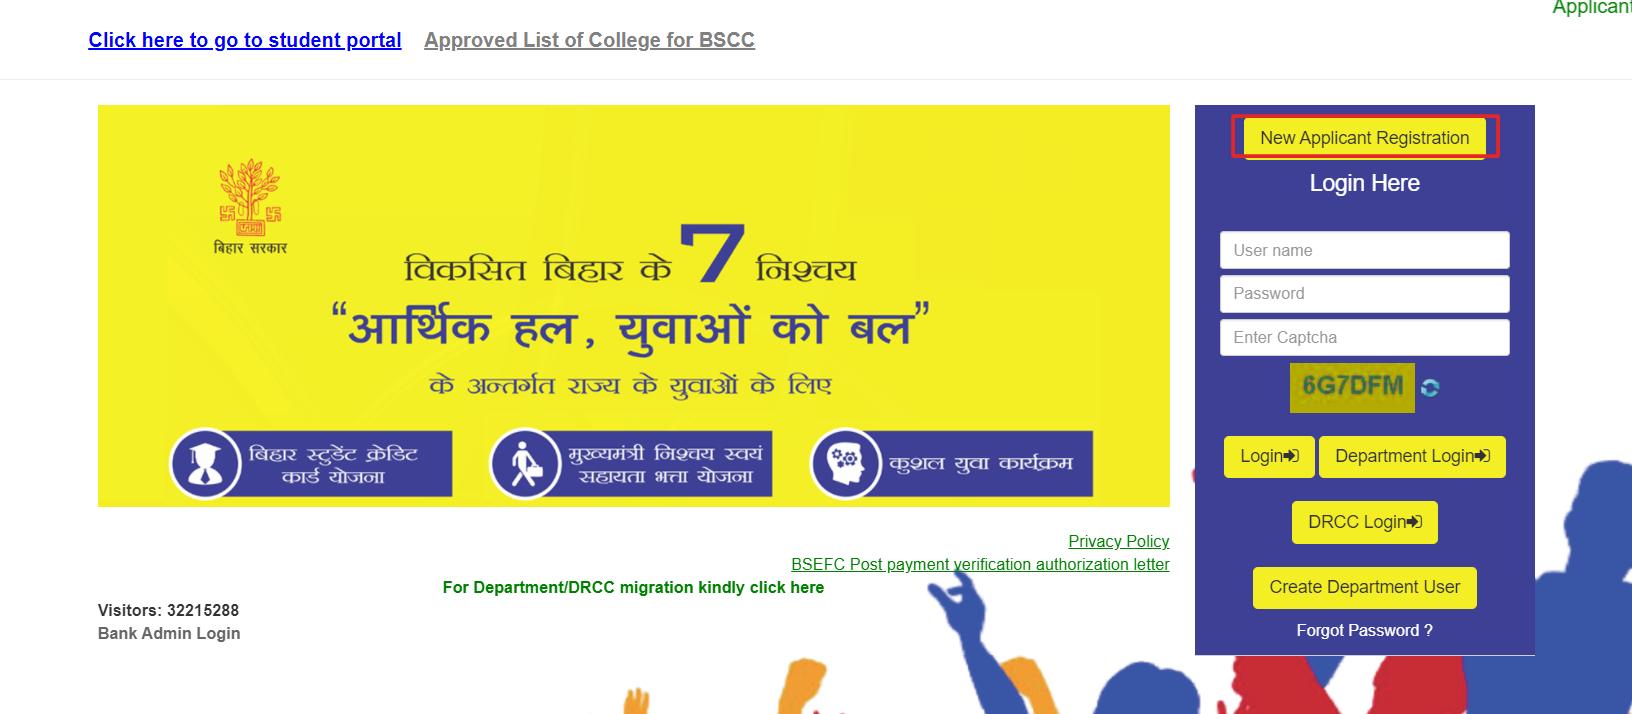 बिहार-स्टूडेंट-क्रेडिट-कार्ड-योजना-ऑनलाइन-आवेदन